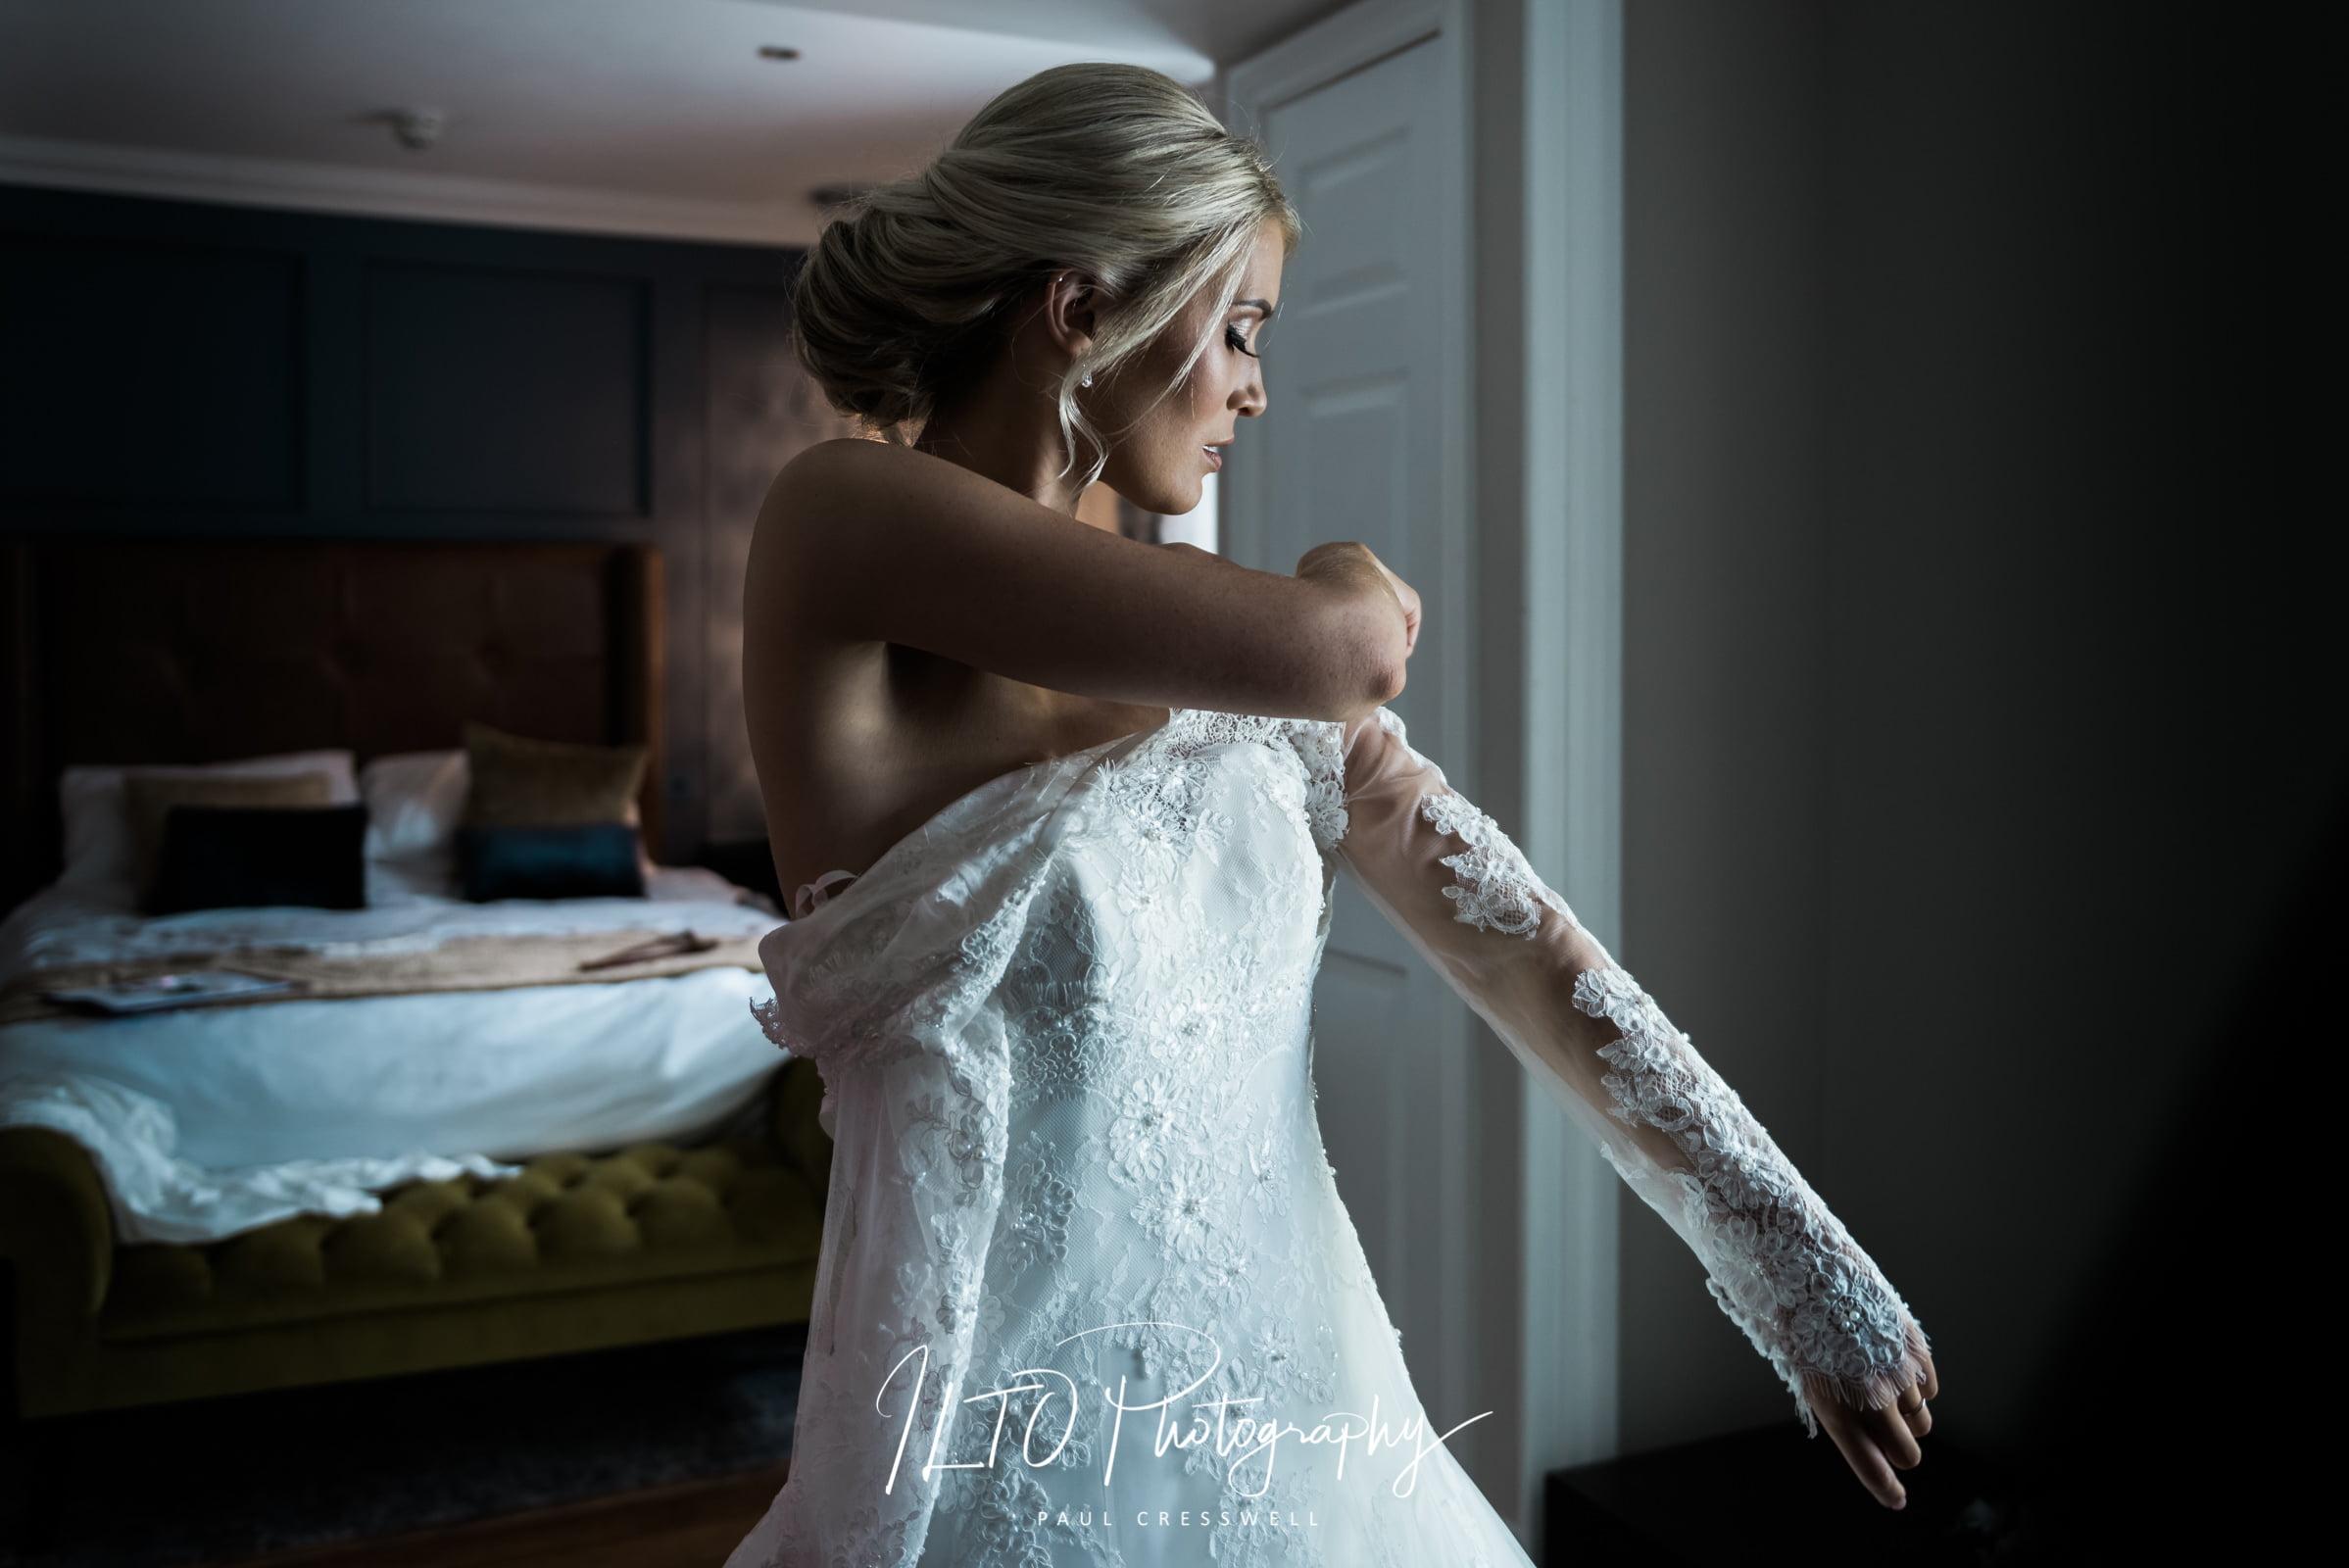 best fine art wedding photos leeds wedding photographer yorkshire near me affordable